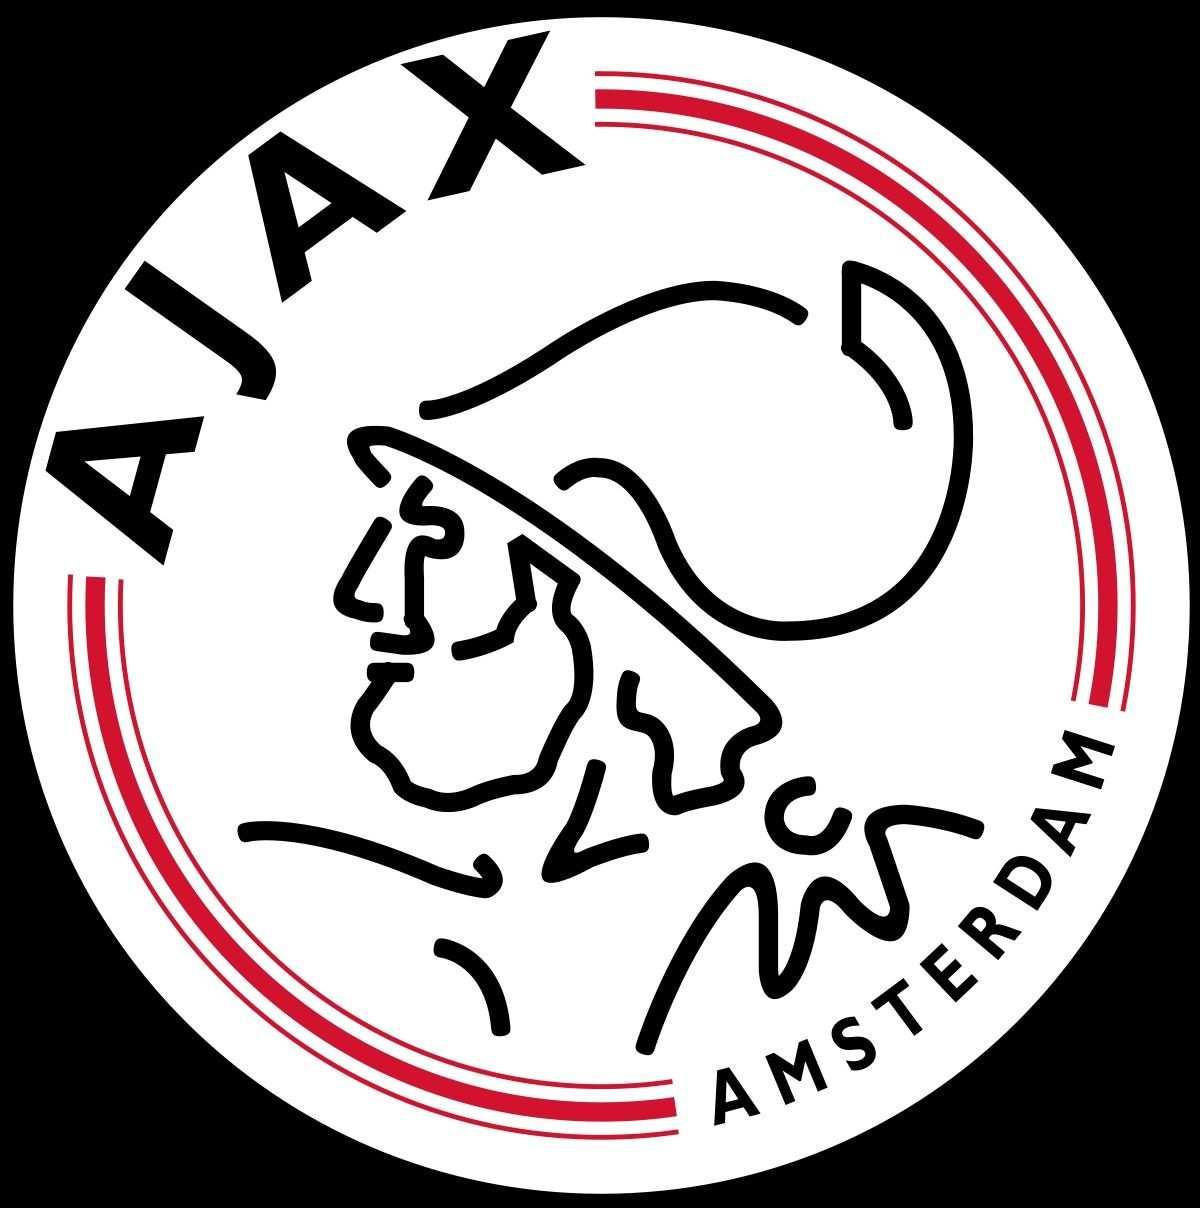 Afbeelding Van Kleurplaten Van Lyn Evers Op Ajax In 2020